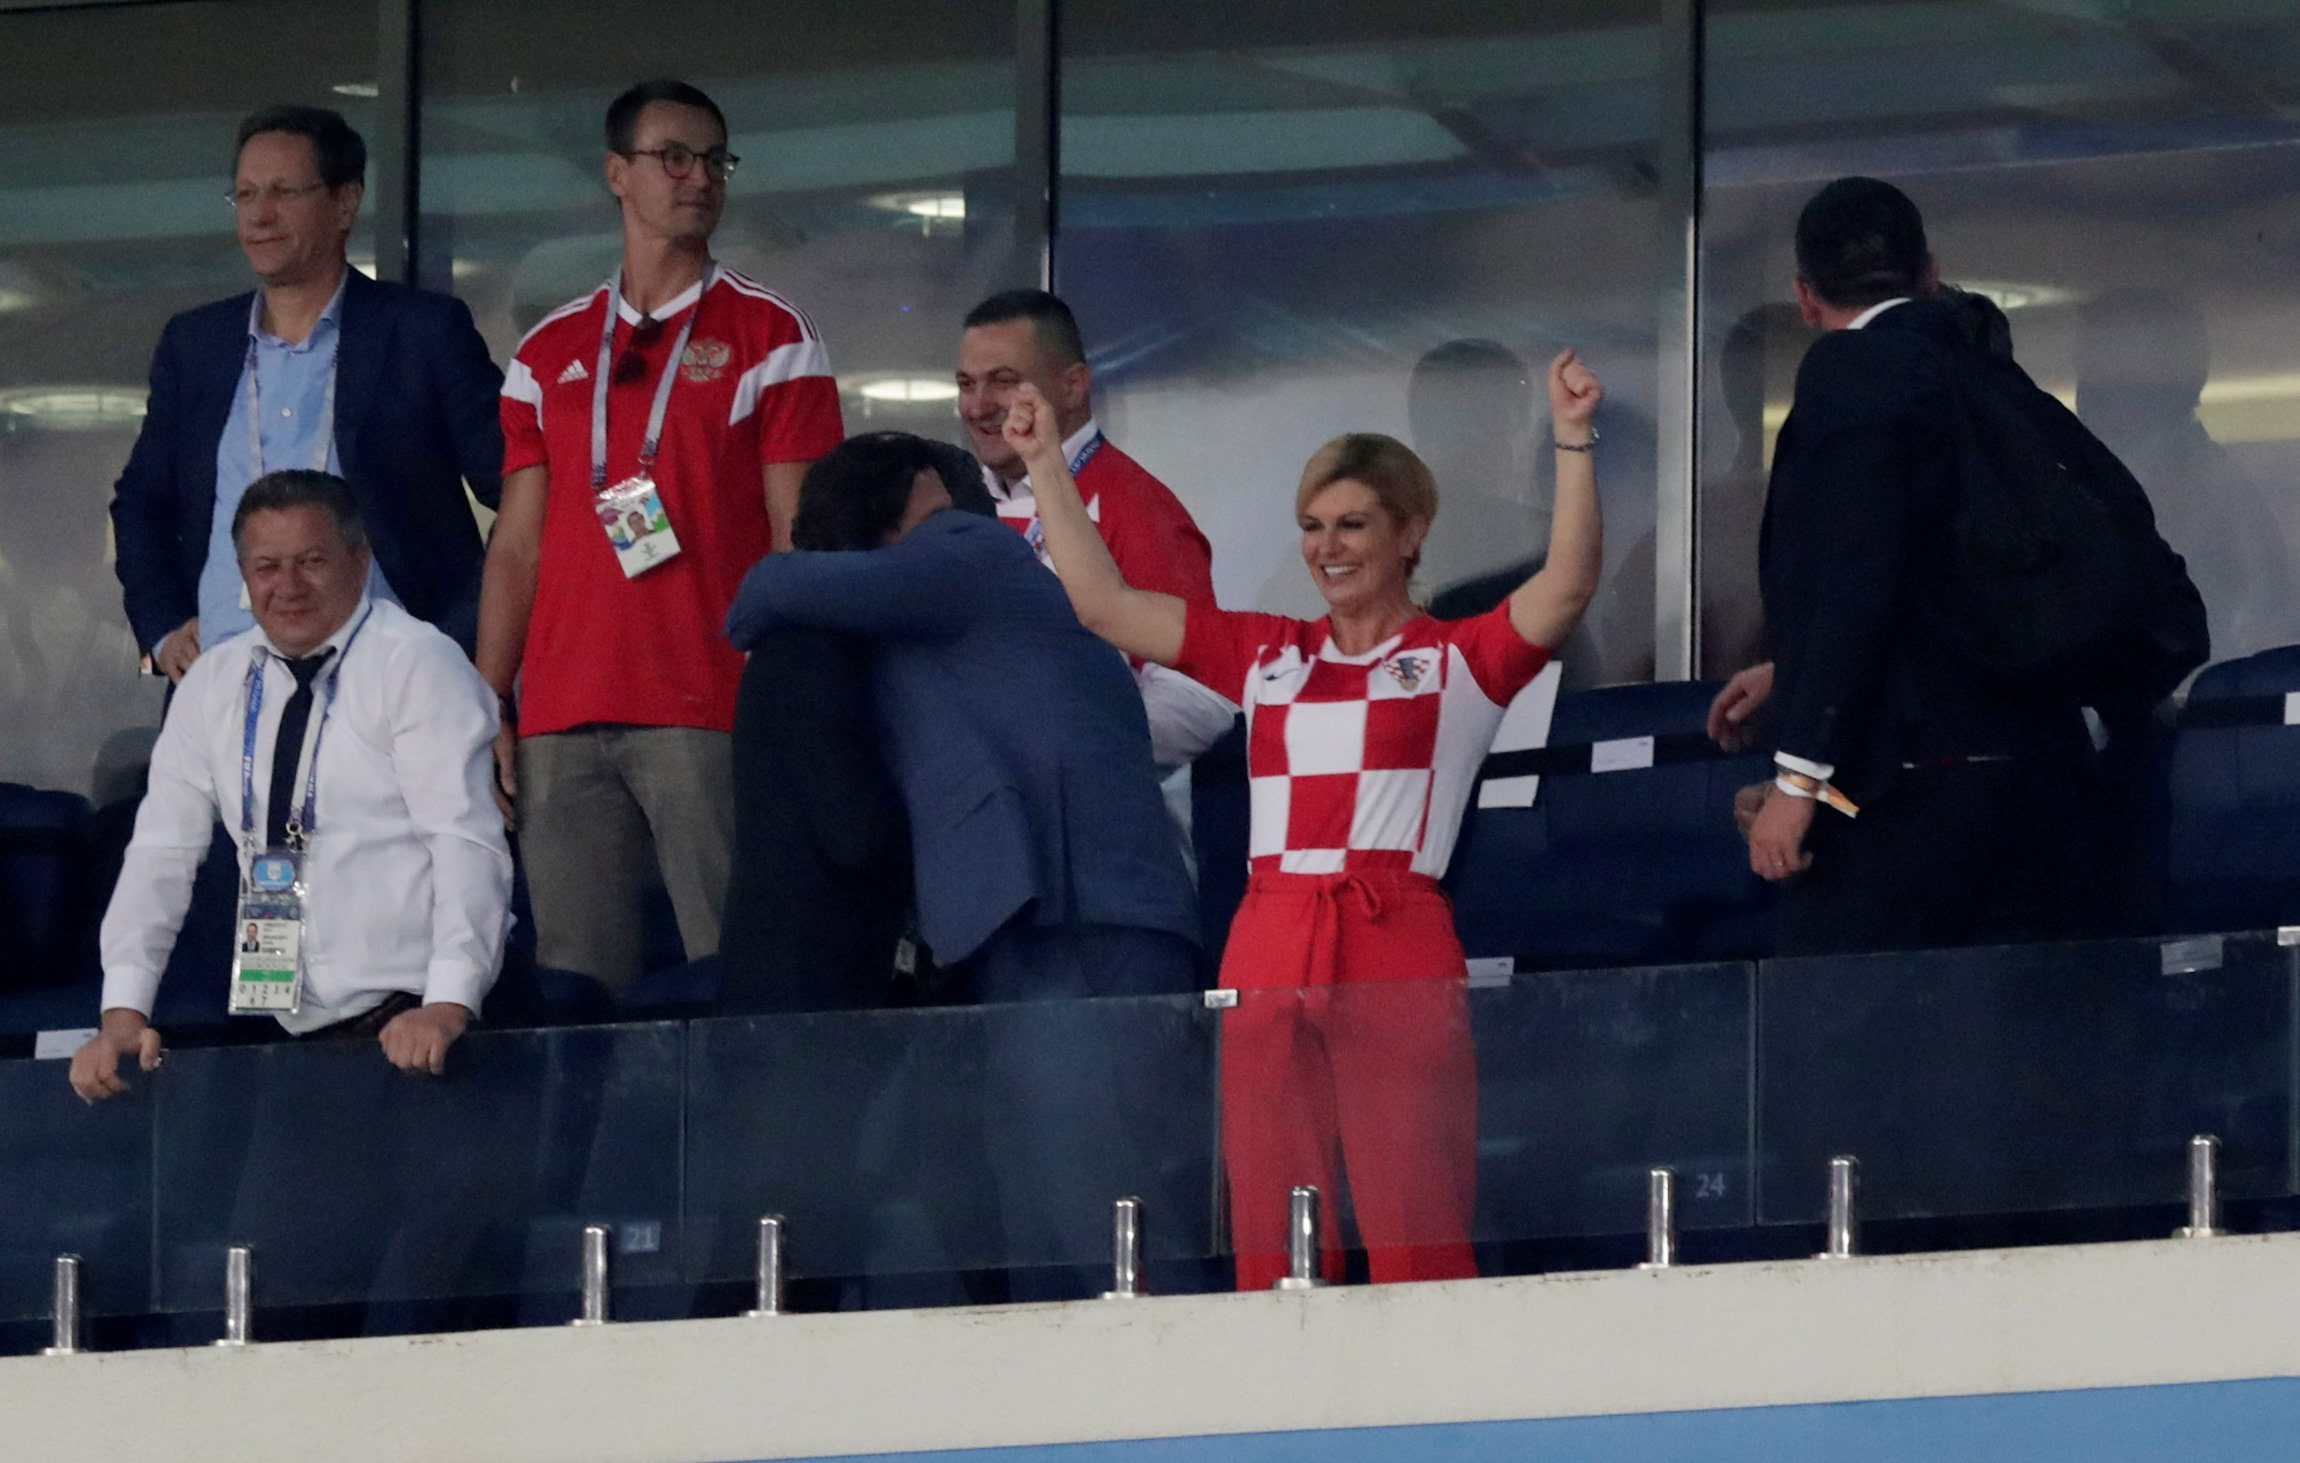 Soccer Football - World Cup - Quarter Final - Russia vs Croatia - Fisht Stadium, Sochi, Russia - July 7, 2018  Croatia president Kolinda Grabar-Kitarovic celebrates in the stand after winning the penalty shootout   REUTERS/Henry Romero